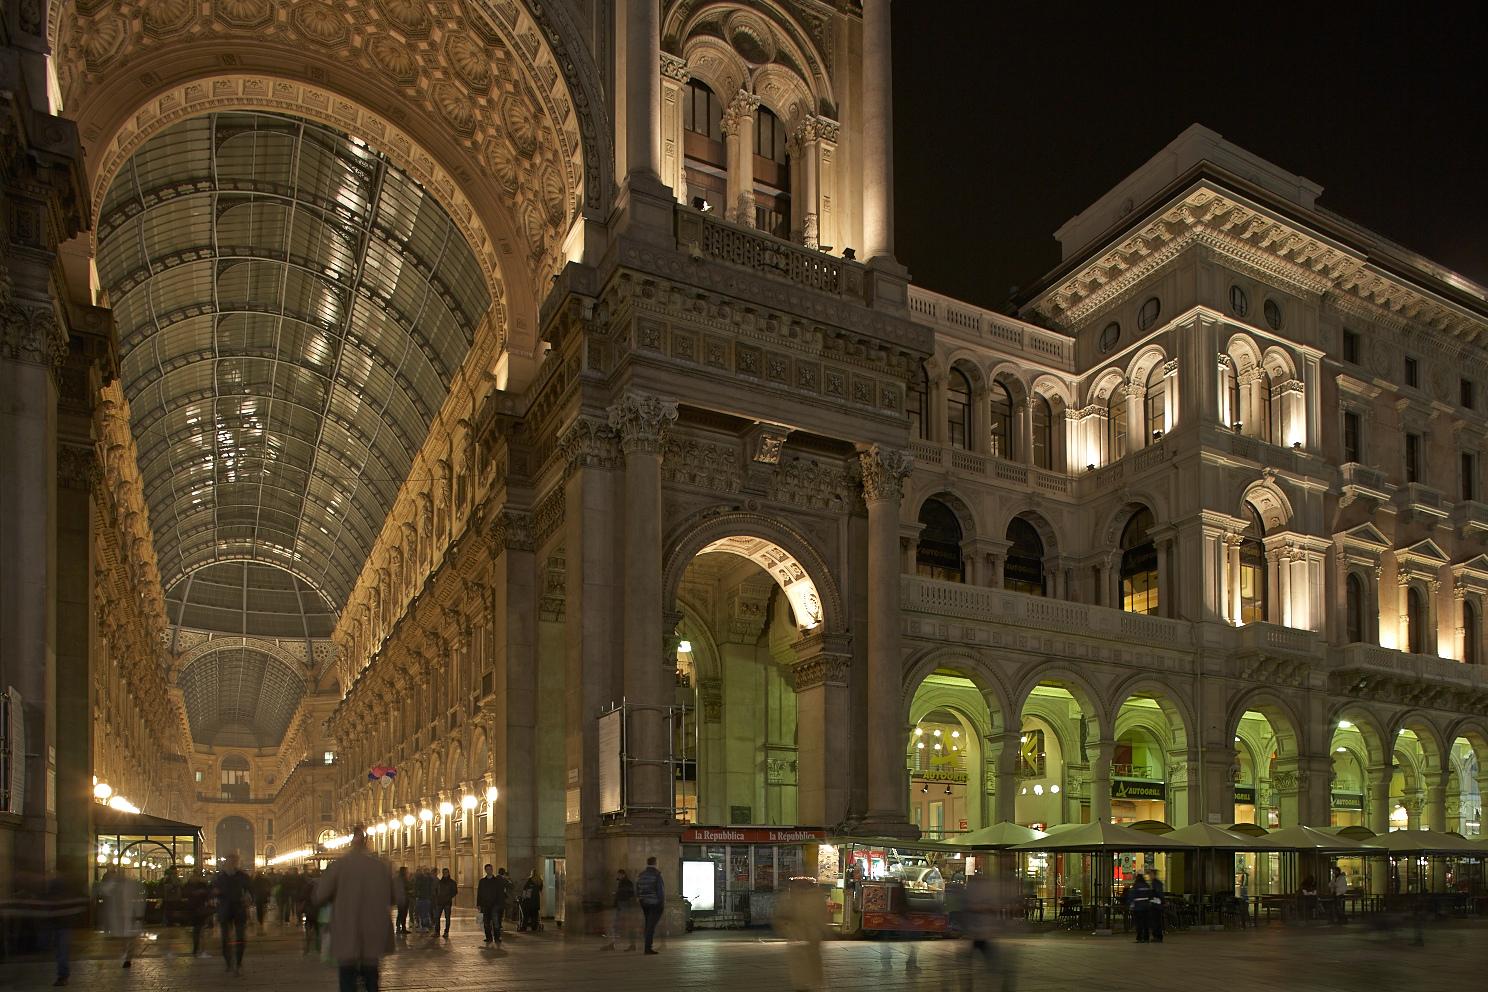 Galleria Vittorio Emanuele II - schöner shoppen